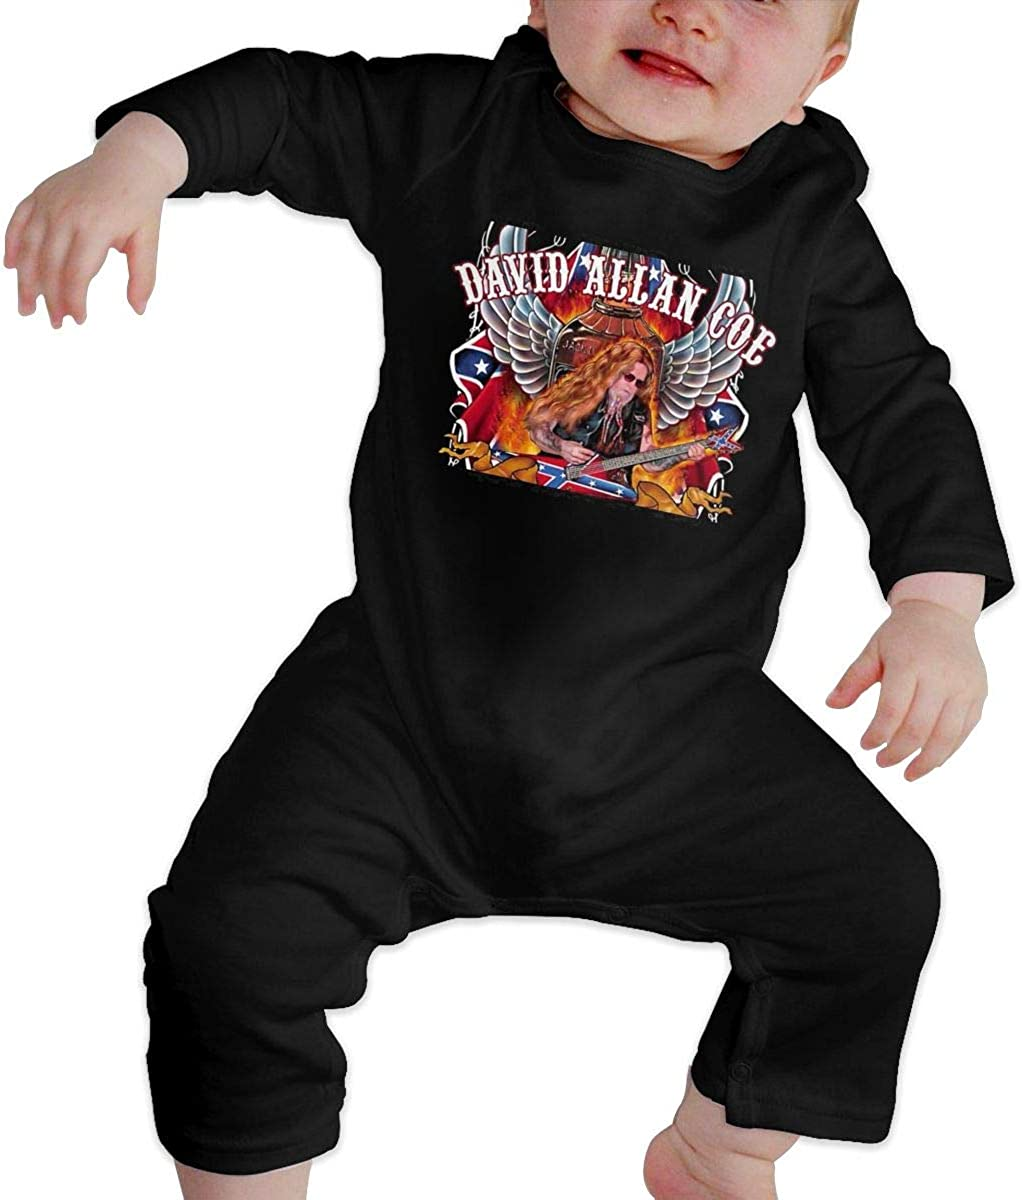 Qq1-asd-store David Allan Coe Boys//Girls Baby Cotton Long Sleeve Romper Warm Bodysuit